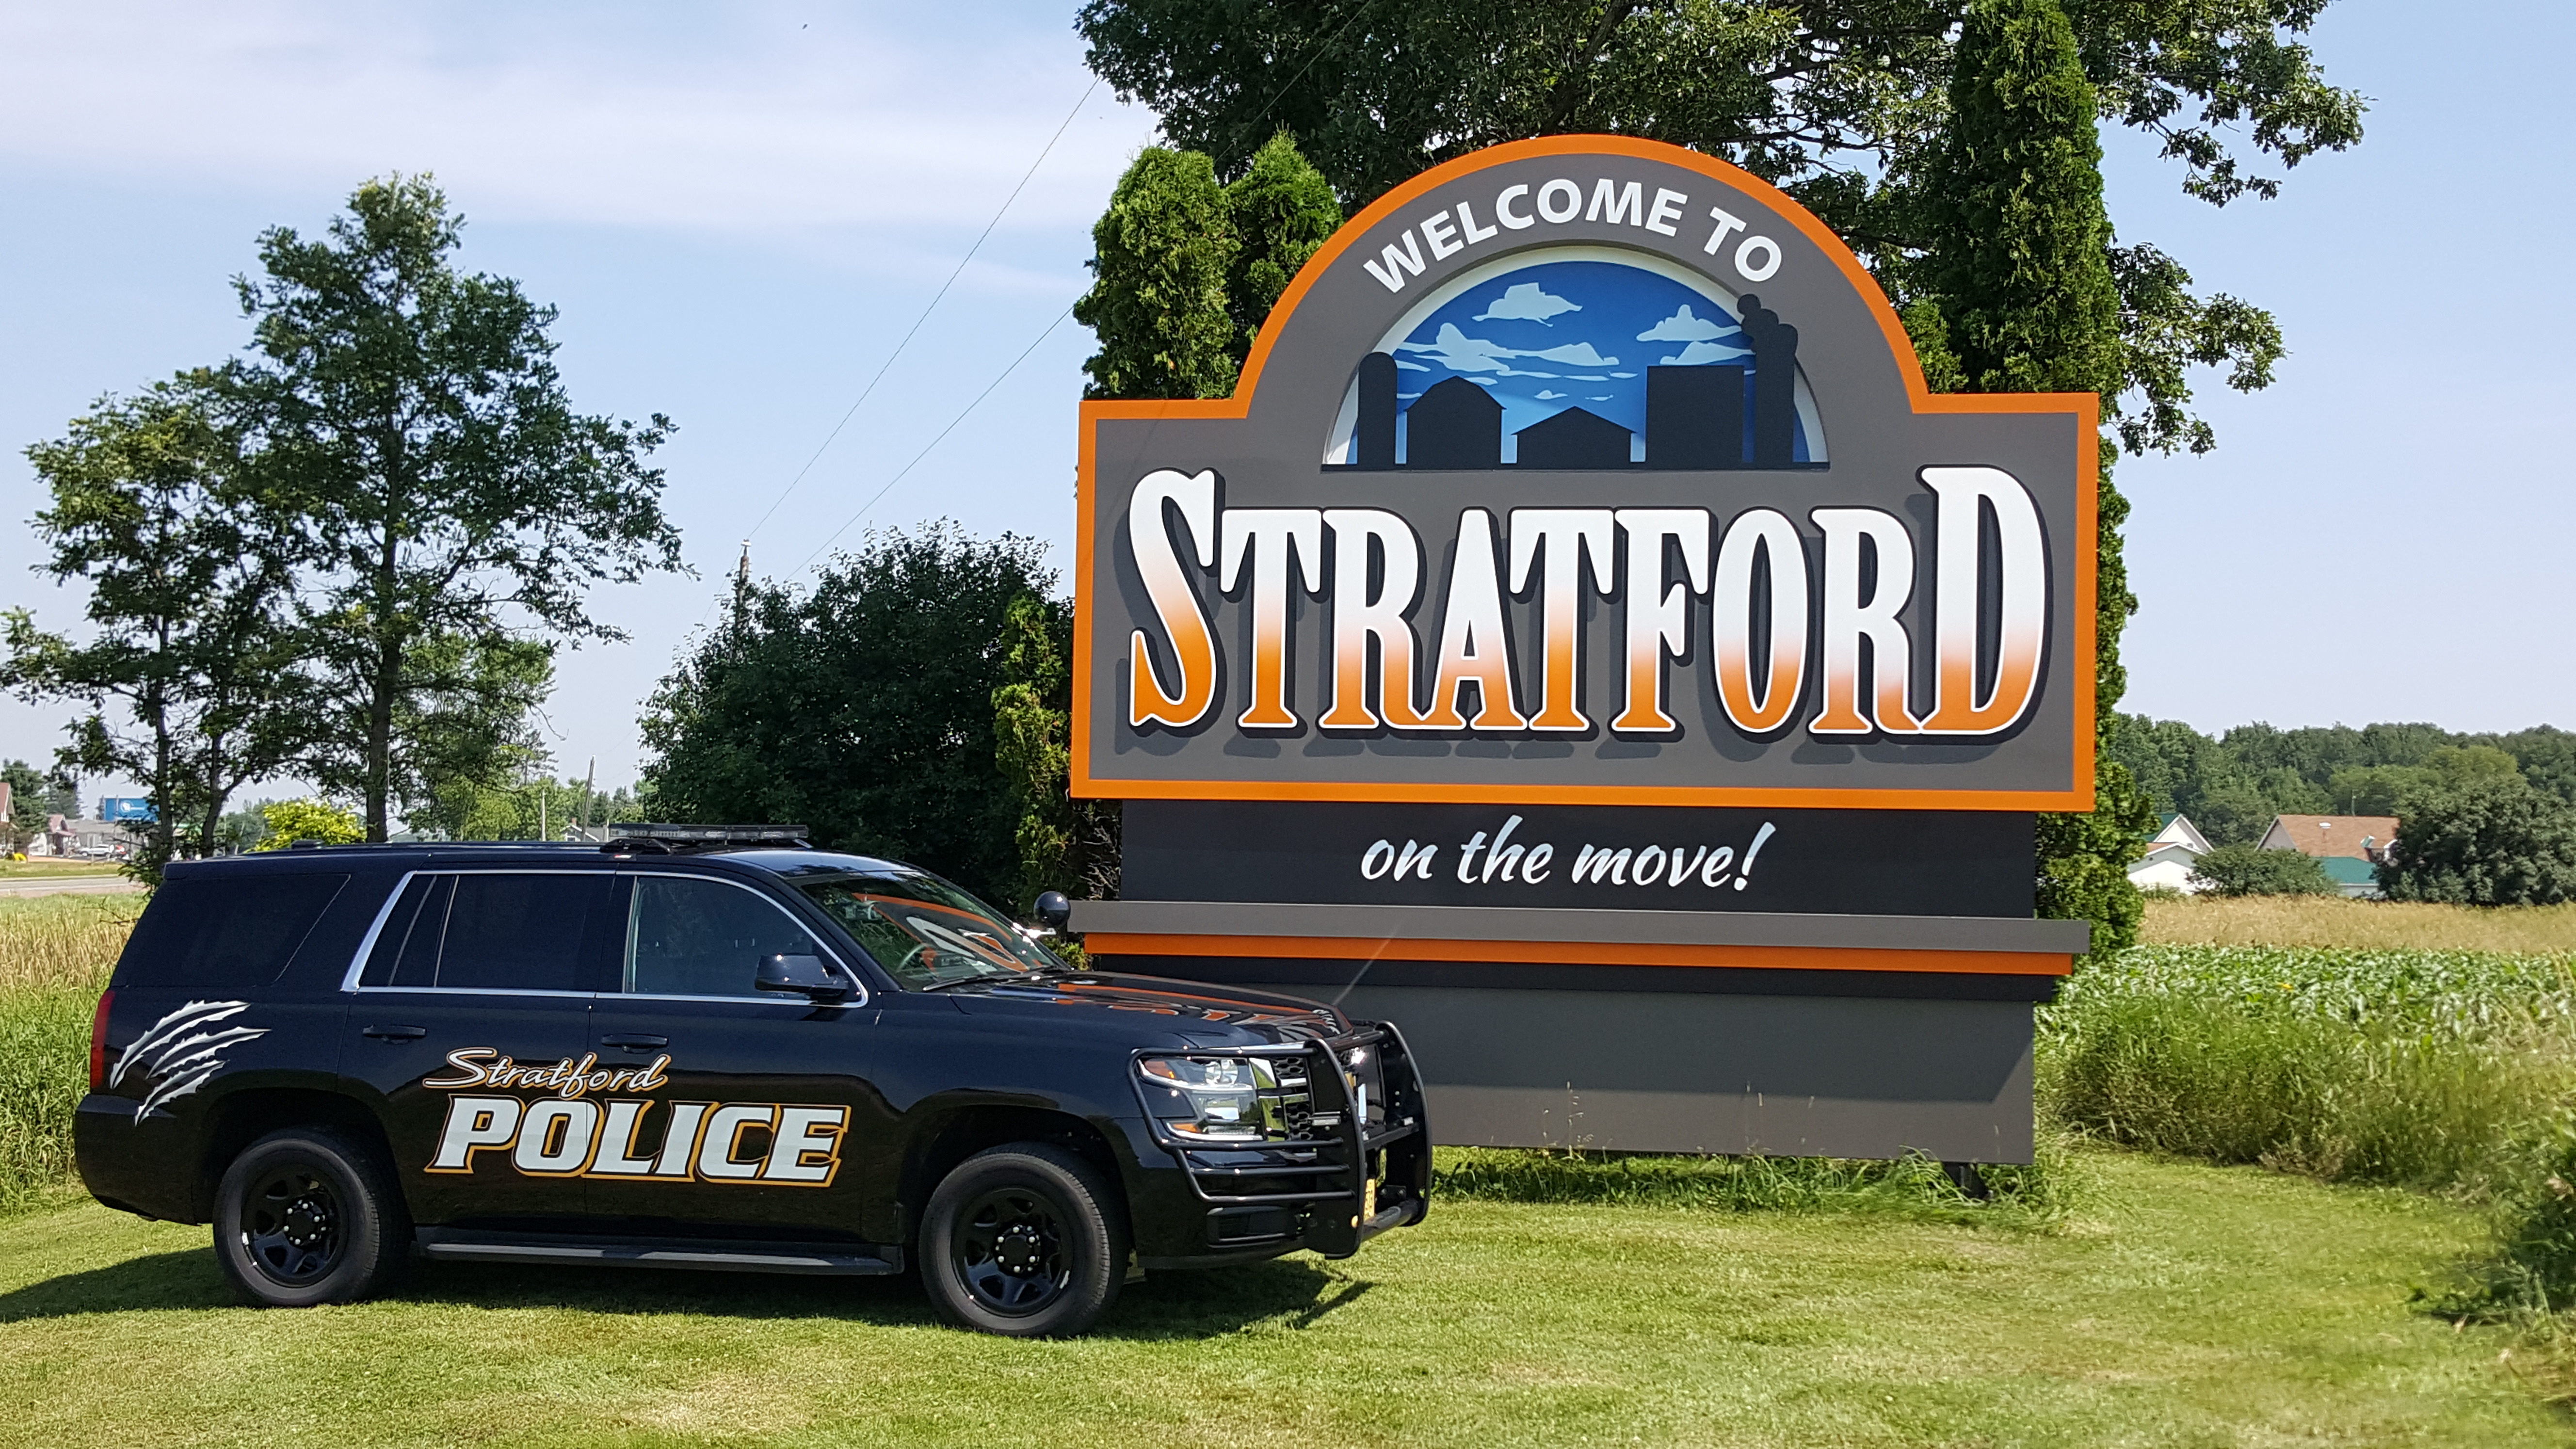 police village of stratford